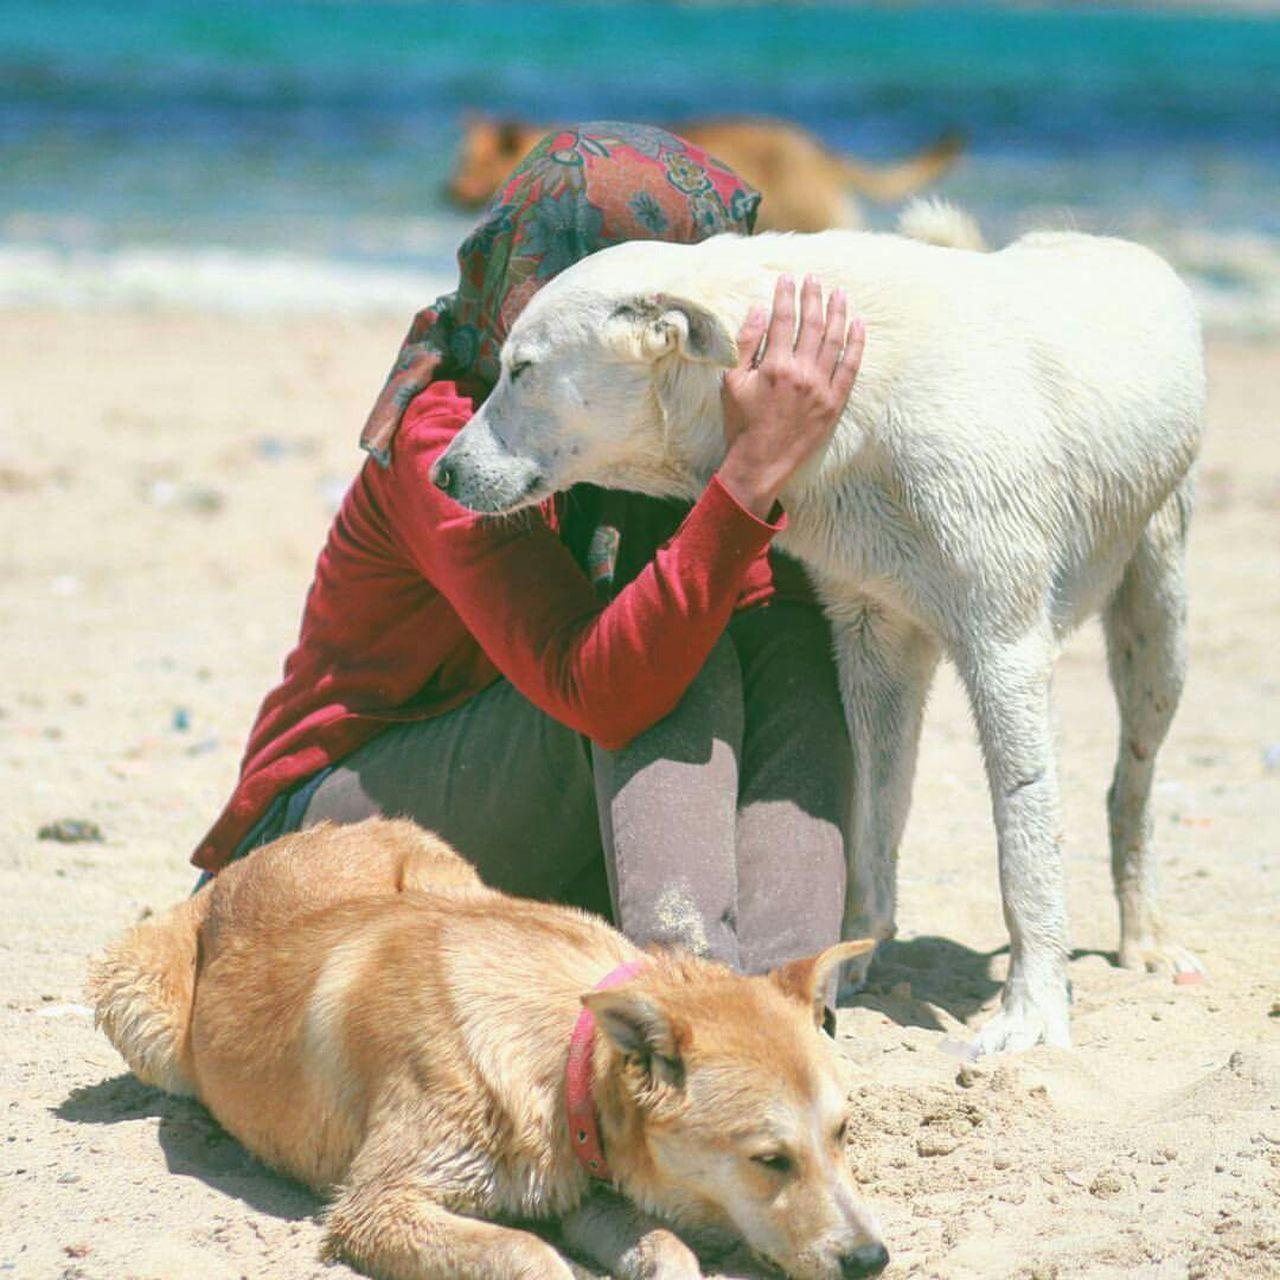 Photographerhibo I Love Dogs Dogs Relaxing Love Lovely Beautiful Portrait Model Doglover Beachphotography Seaside Dog❤ Dogstagram Ilovedogs Lovelovelove Paece Wine Moments